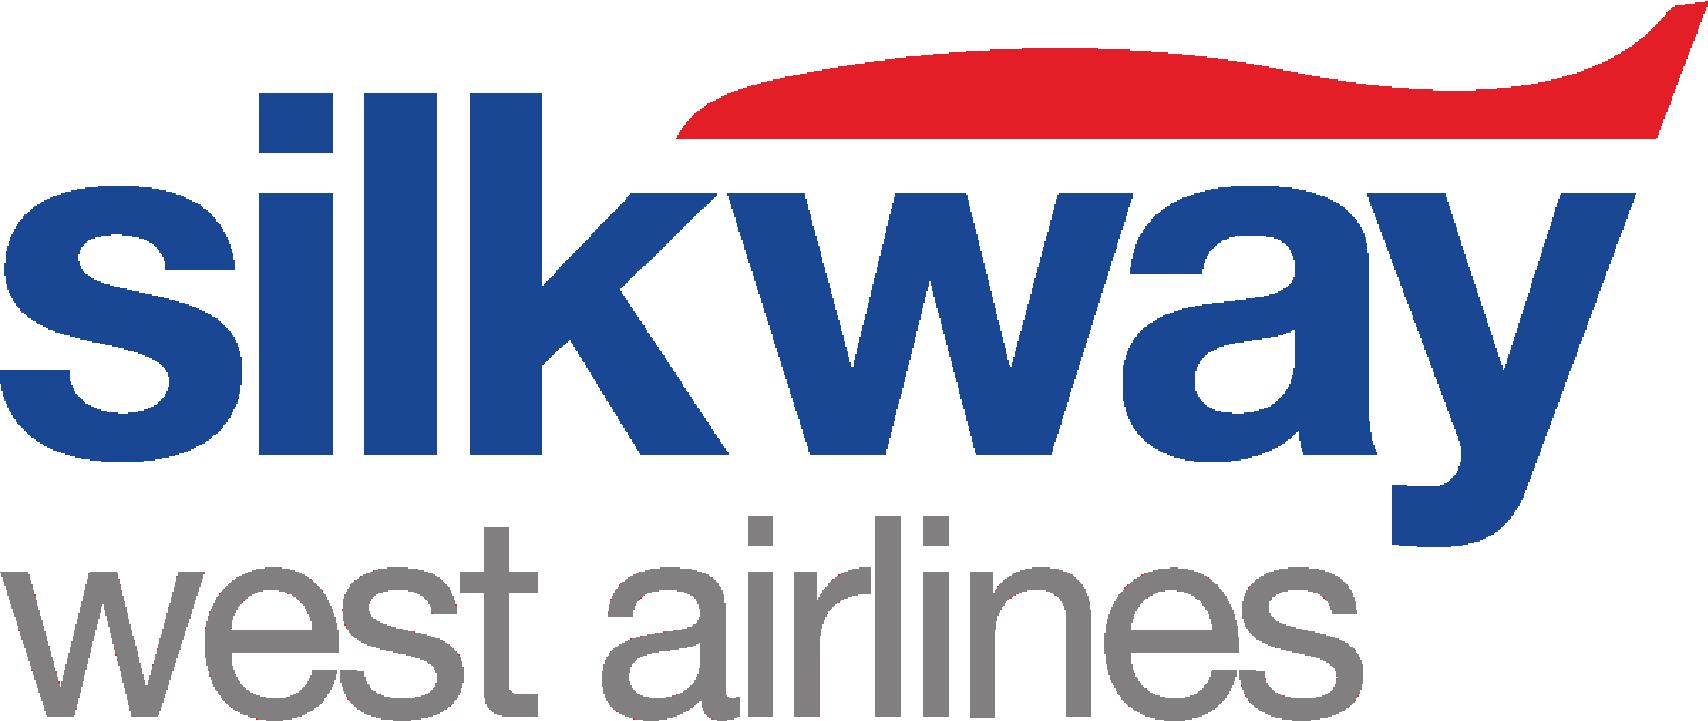 Silk Way West logo